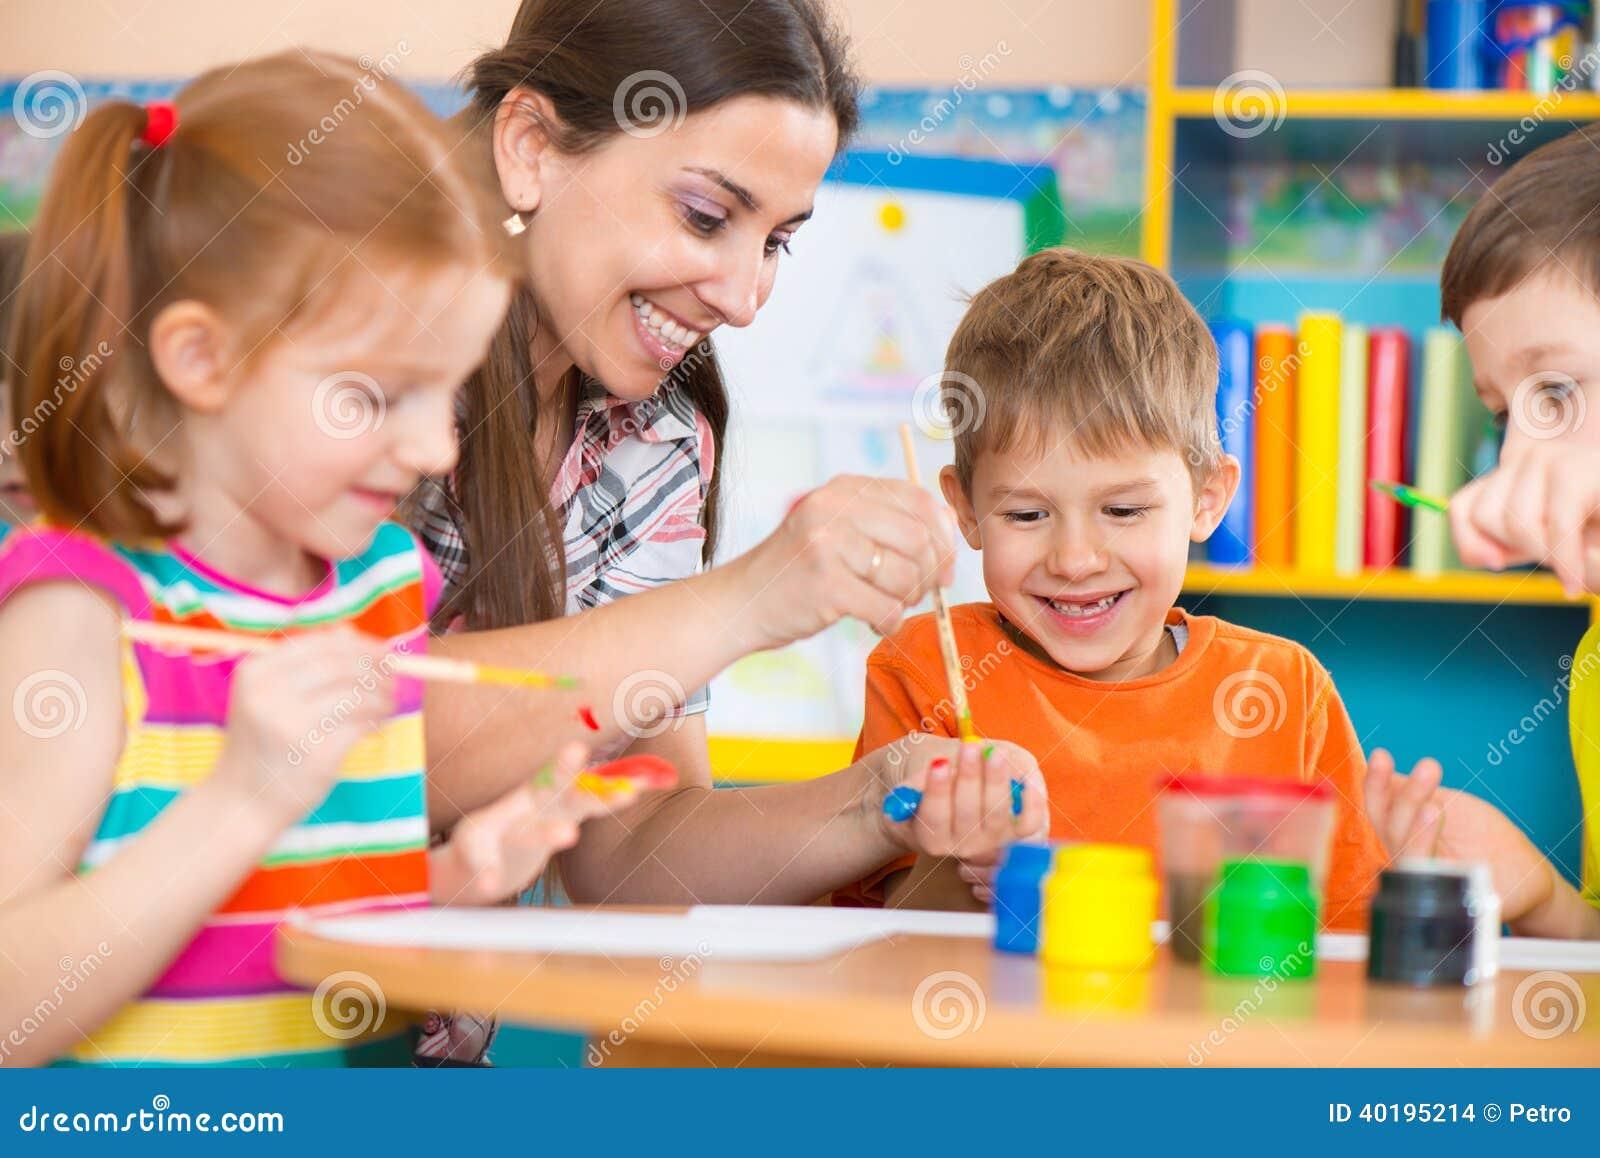 how to teach mukhlis to children